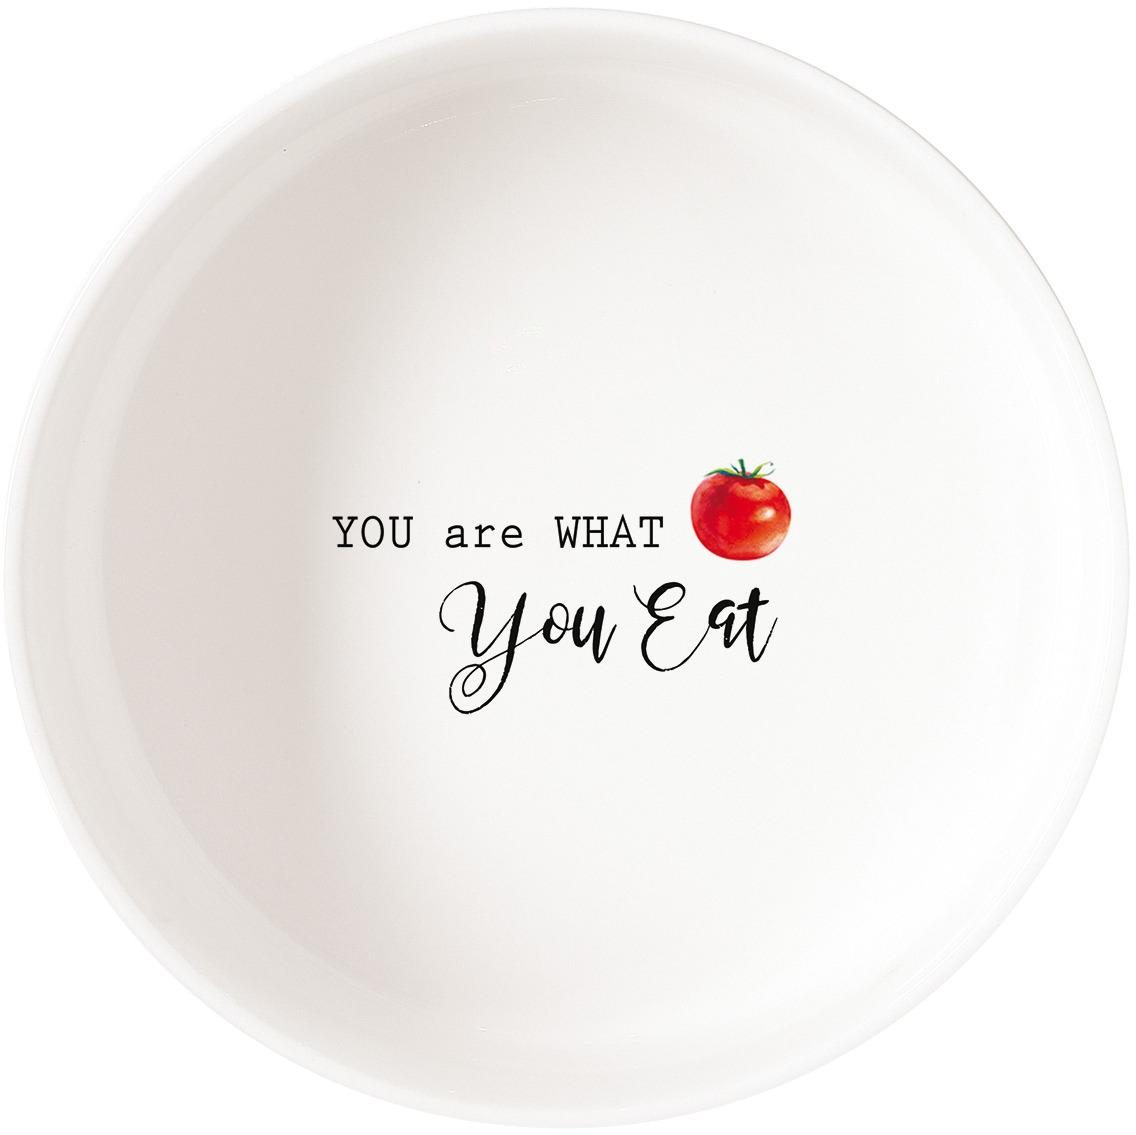 Салатник Easy Life Kitchen Elements, цвет: белый, 1000 мл. EL-R1909/KITE